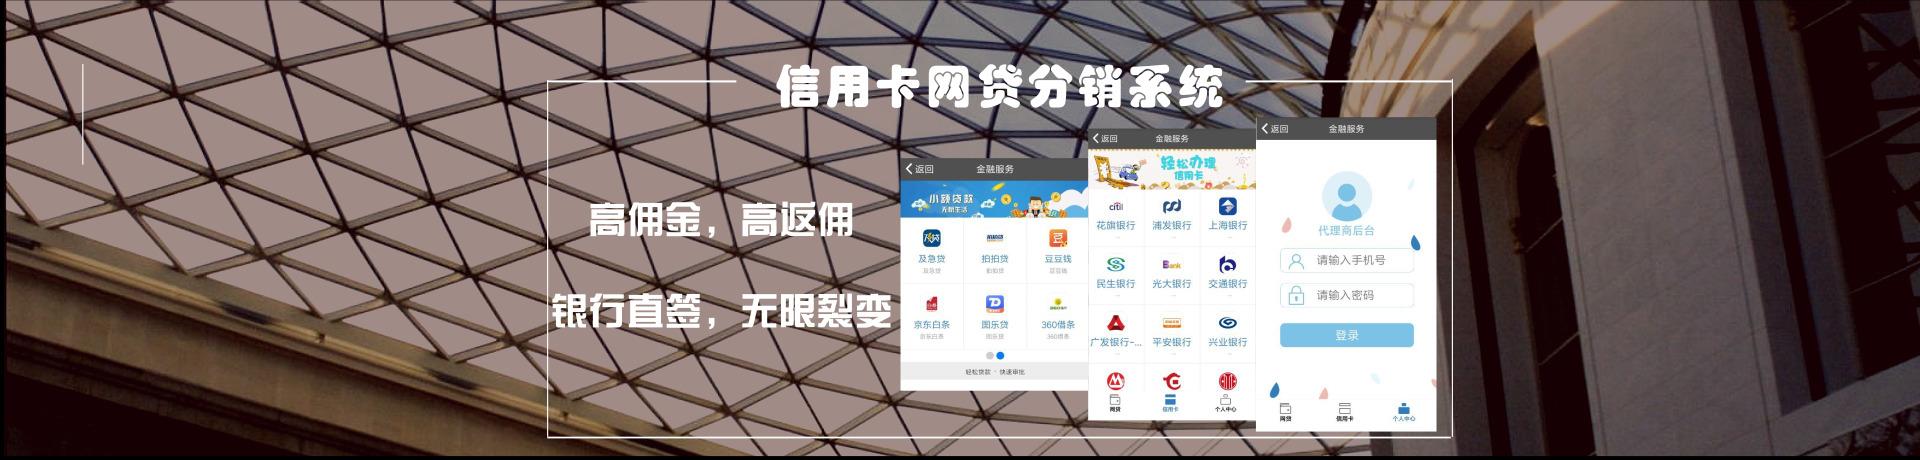 信用卡申請平臺banner